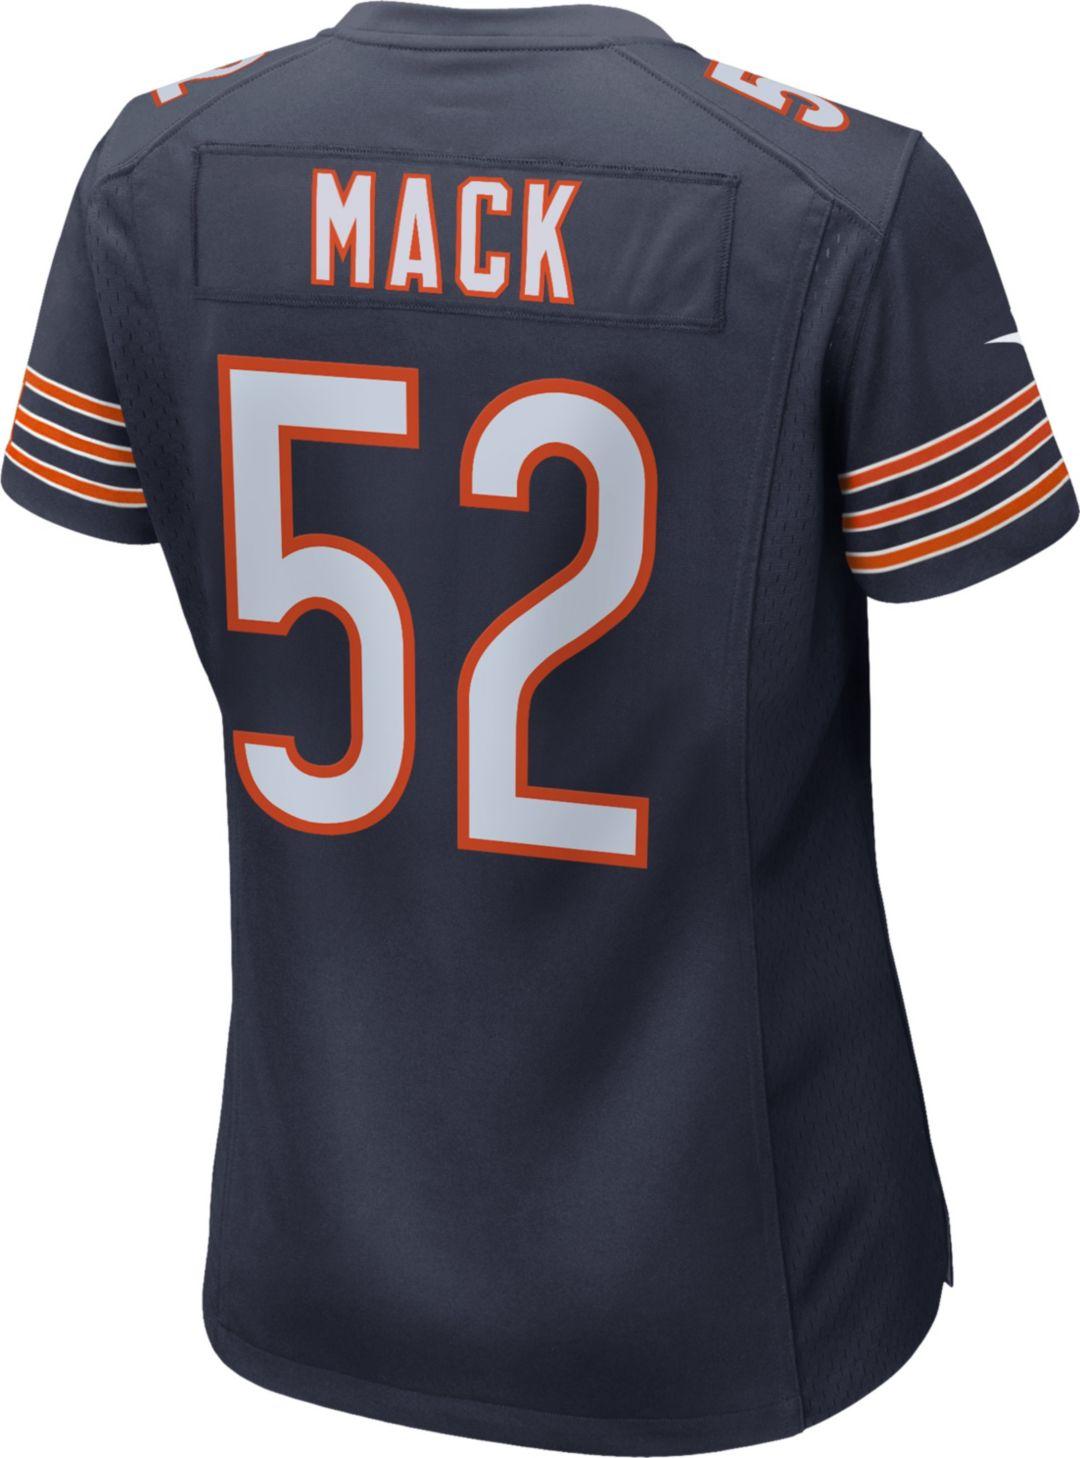 wholesale dealer ea895 76061 Nike Women's Home Game Jersey Chicago Bears Khalil Mack #52